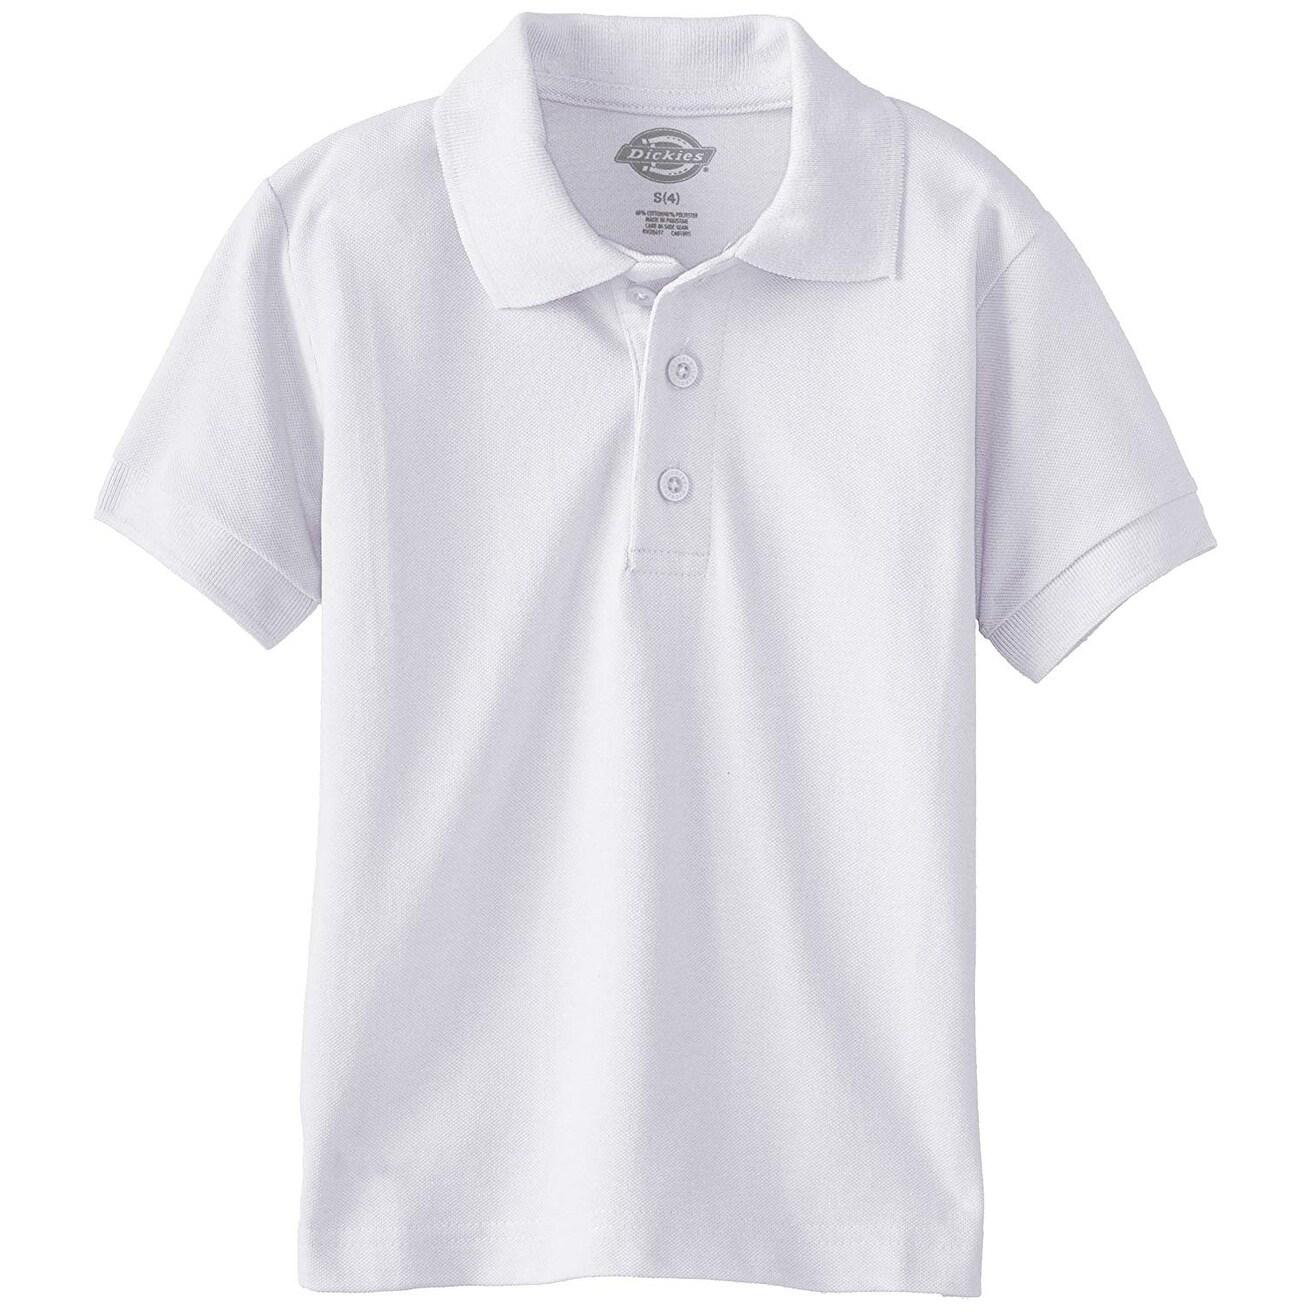 Dickies Big Boys' Short Sleeve Pique Polo Shirt,, White, Size Medium 10-12 - Medium 10-12